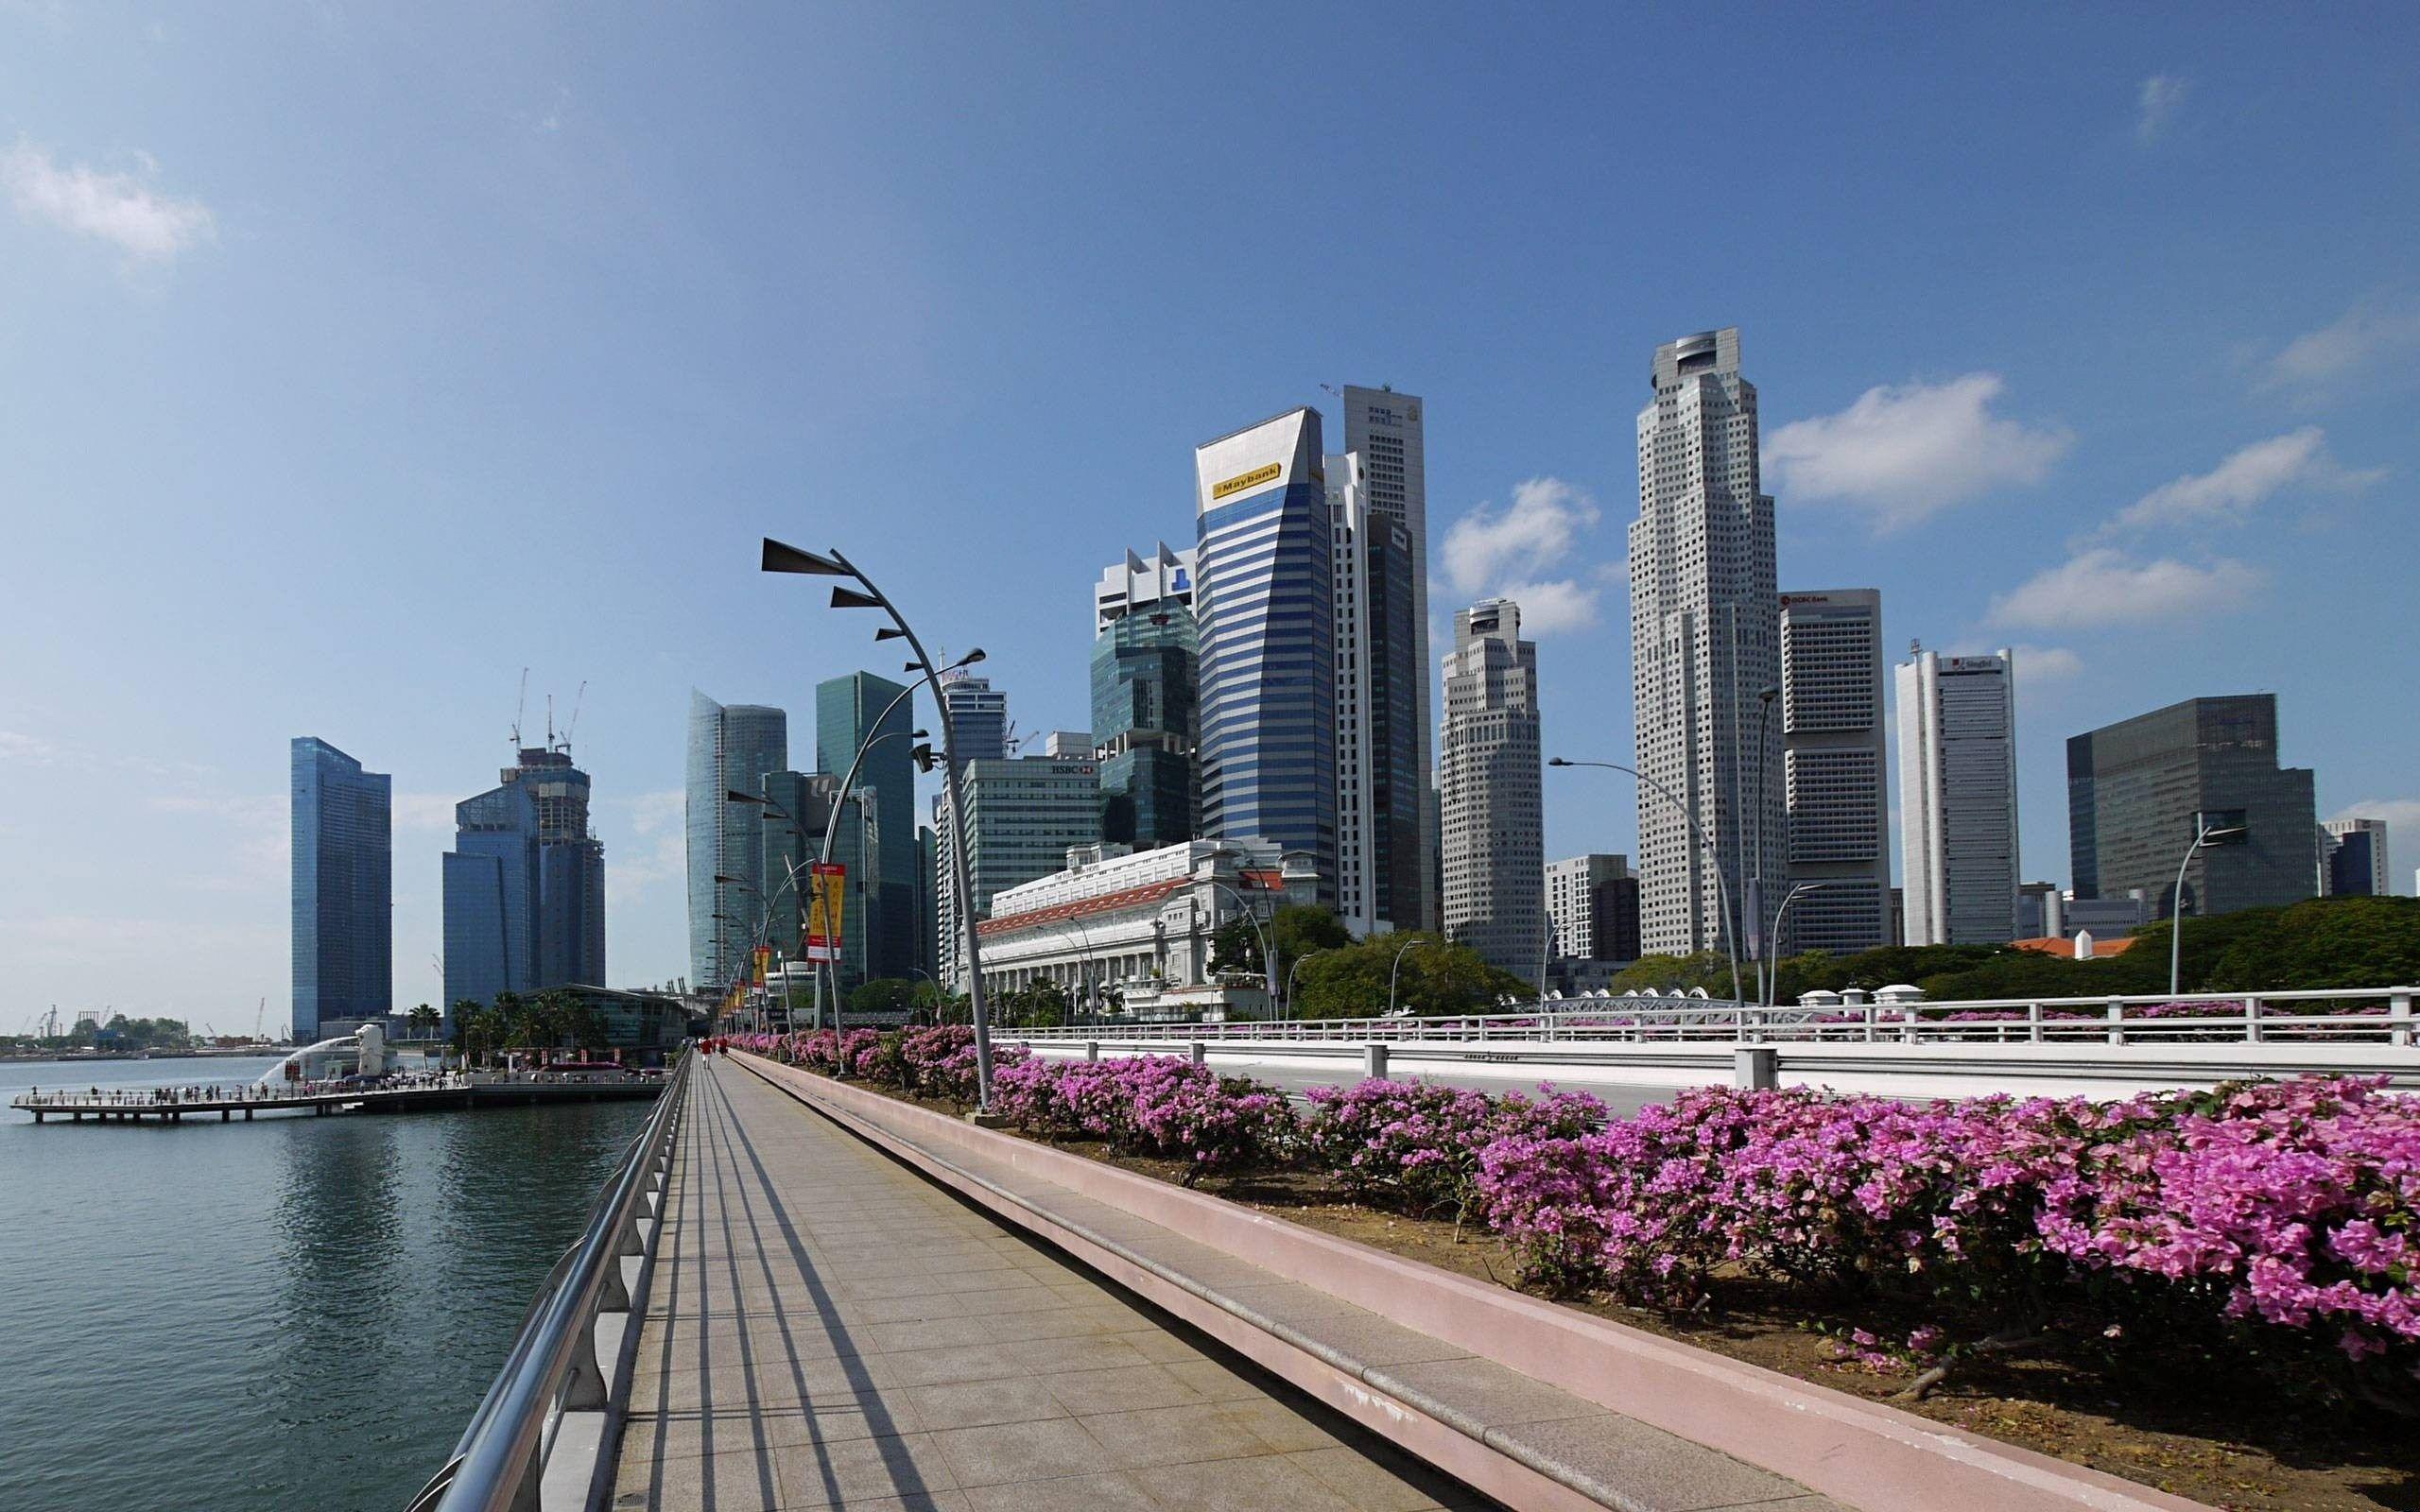 Elazar MK on LinkedIn Inside Singapore's famous Raffles